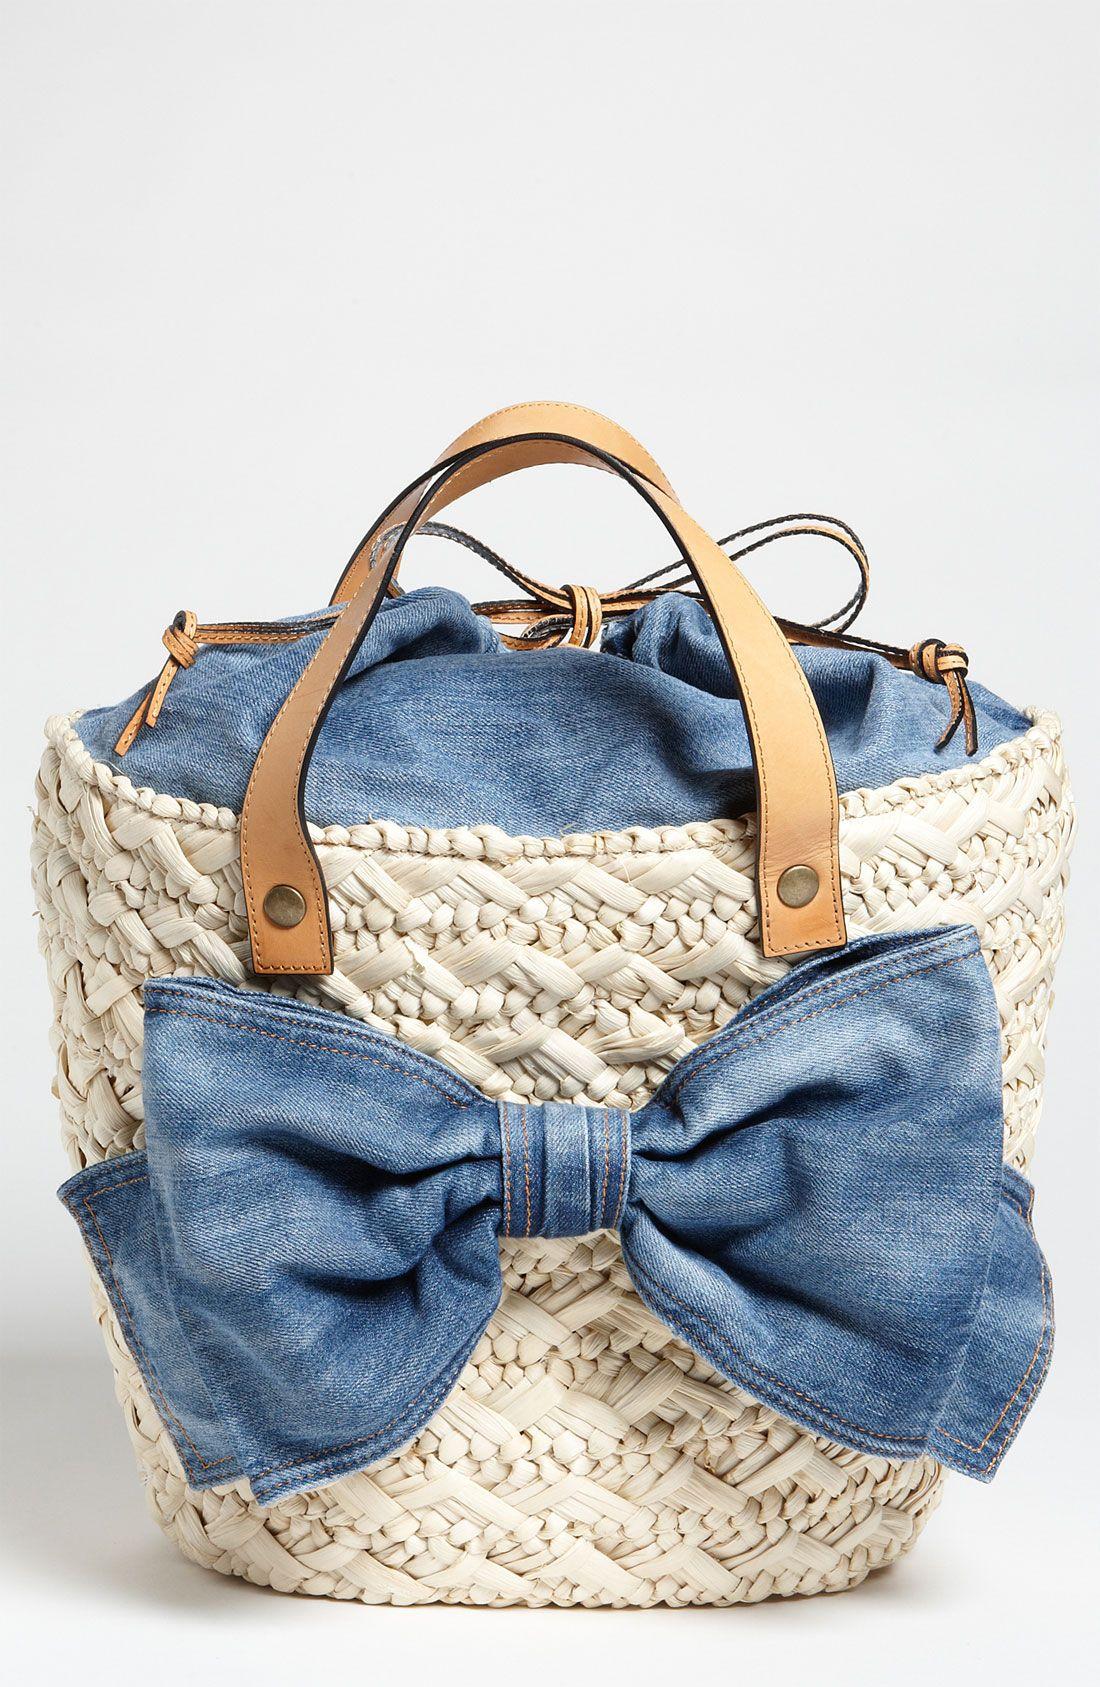 94a6f190406 Red Valentino Straw Denim Bow Bucket Bag in Beige (denim) | All ...